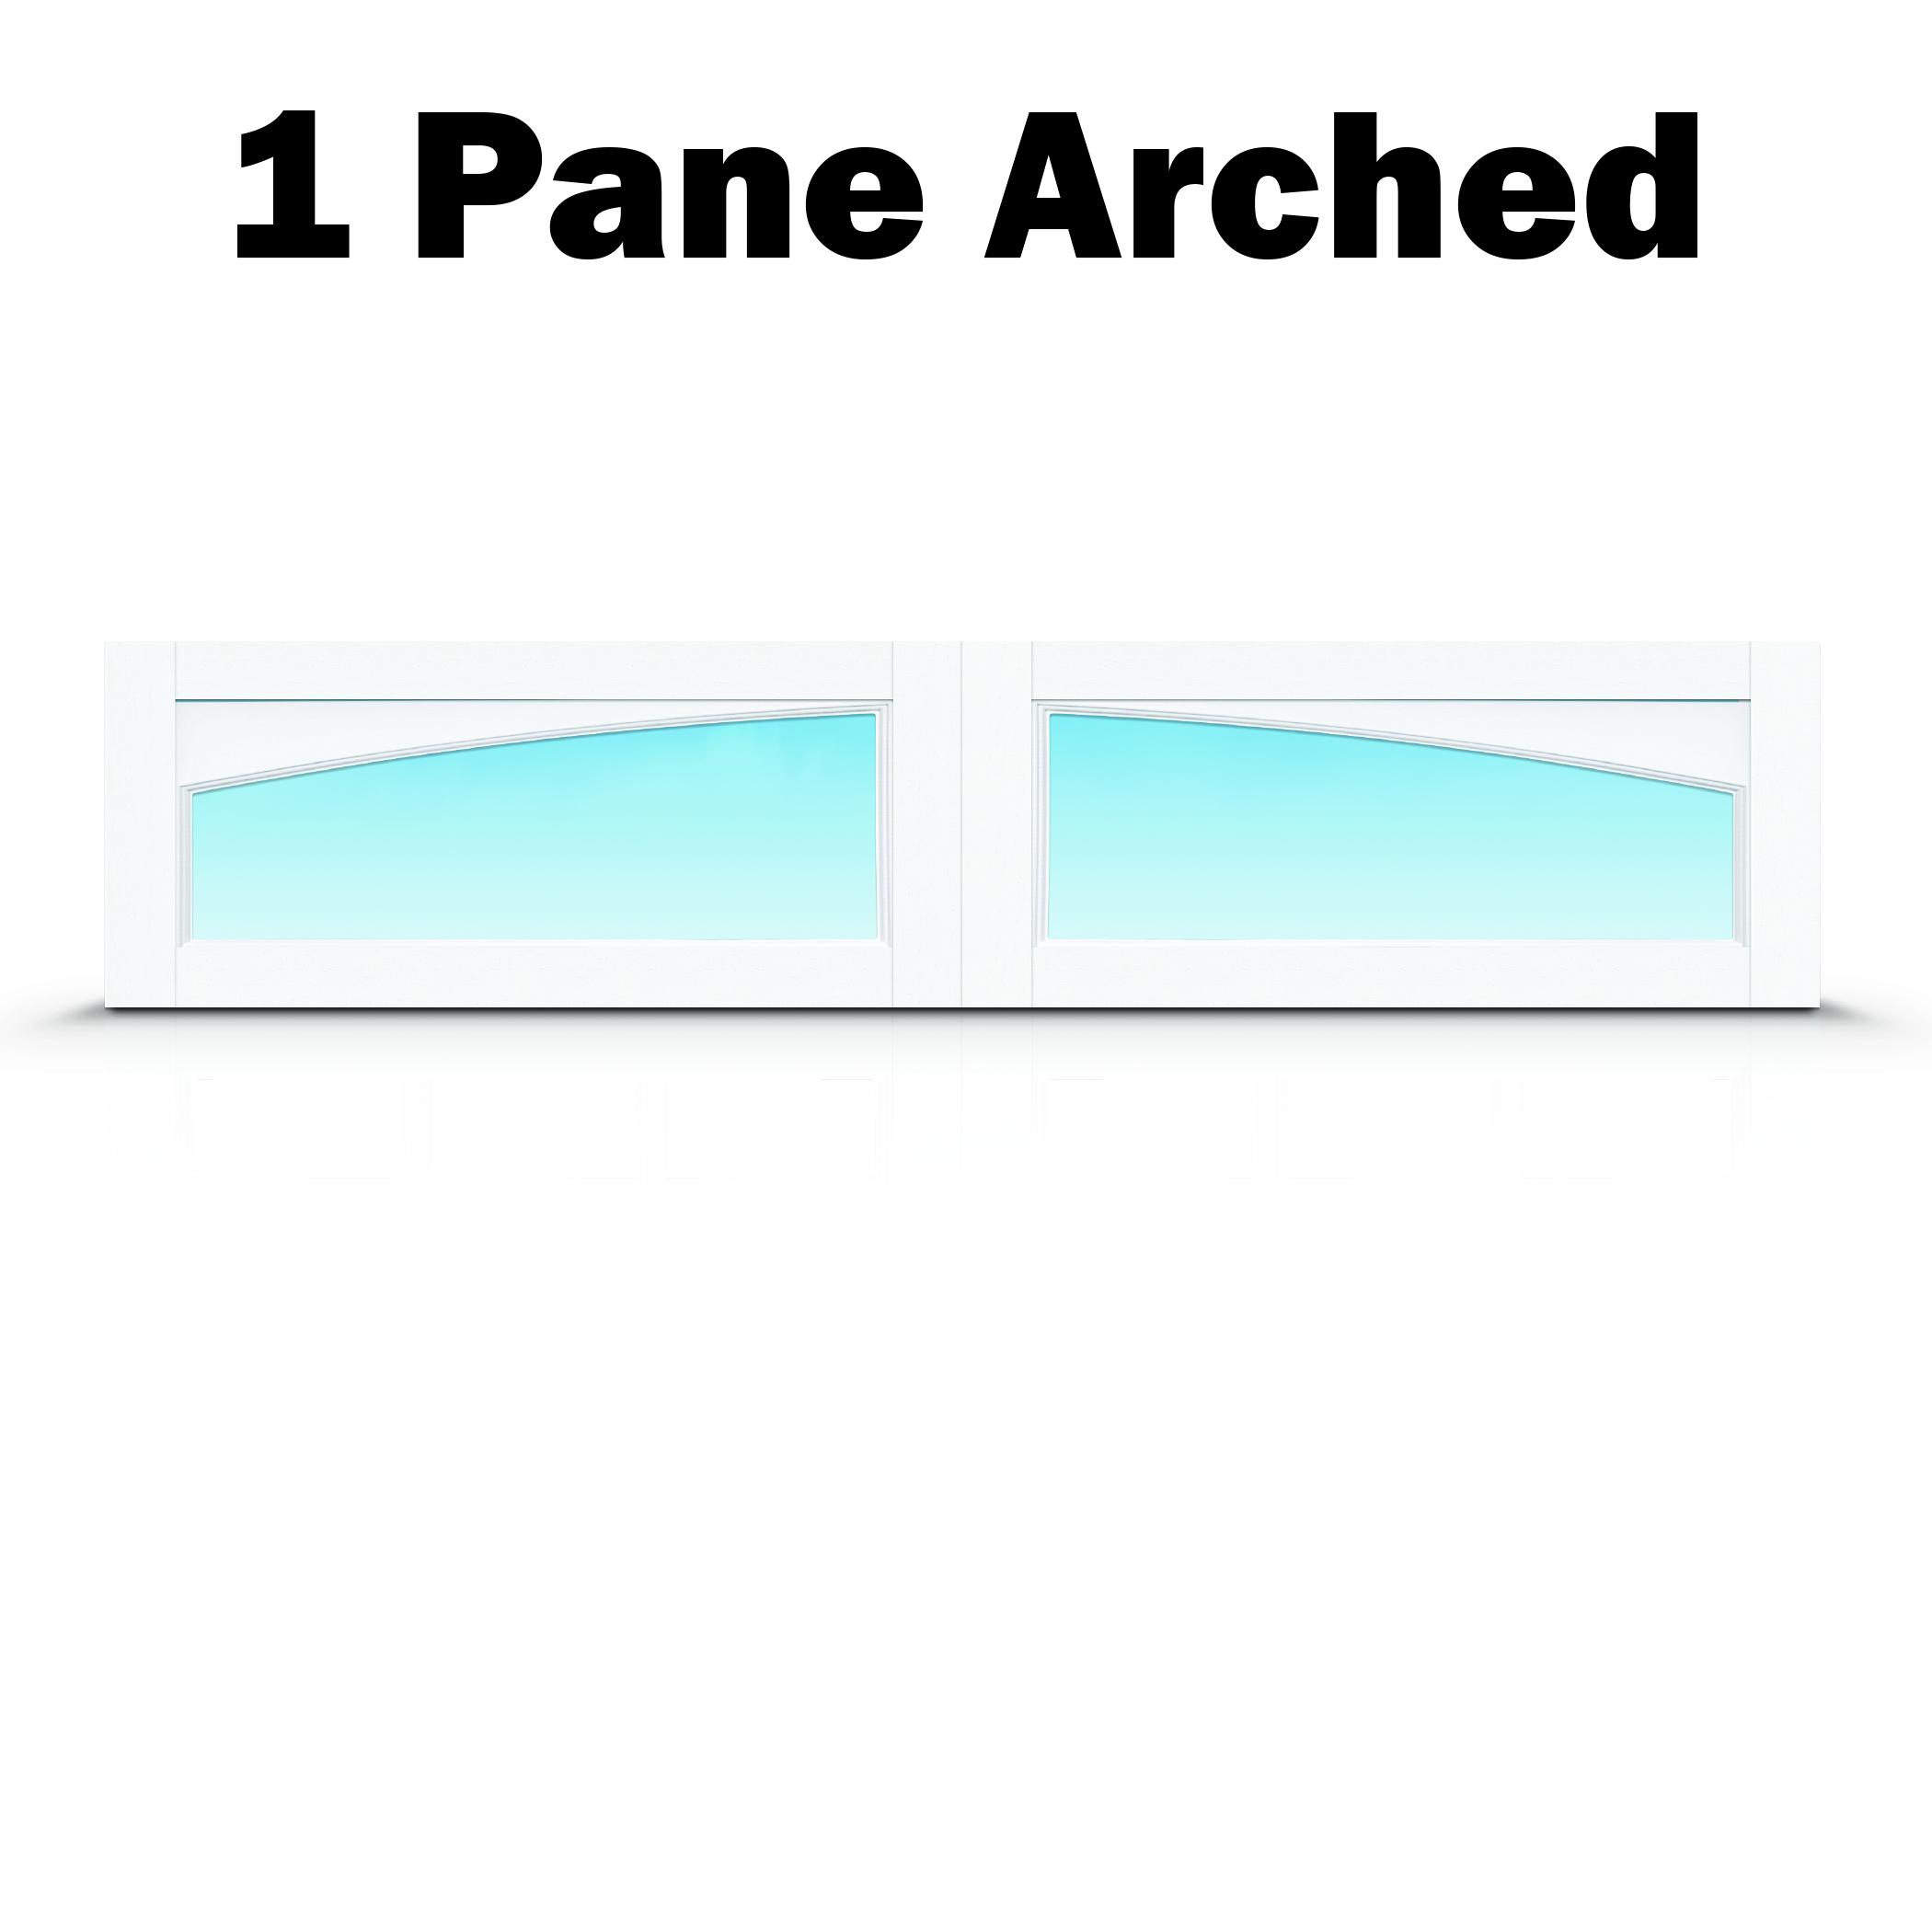 1 Pane Arched - Echo Ridge.jpg